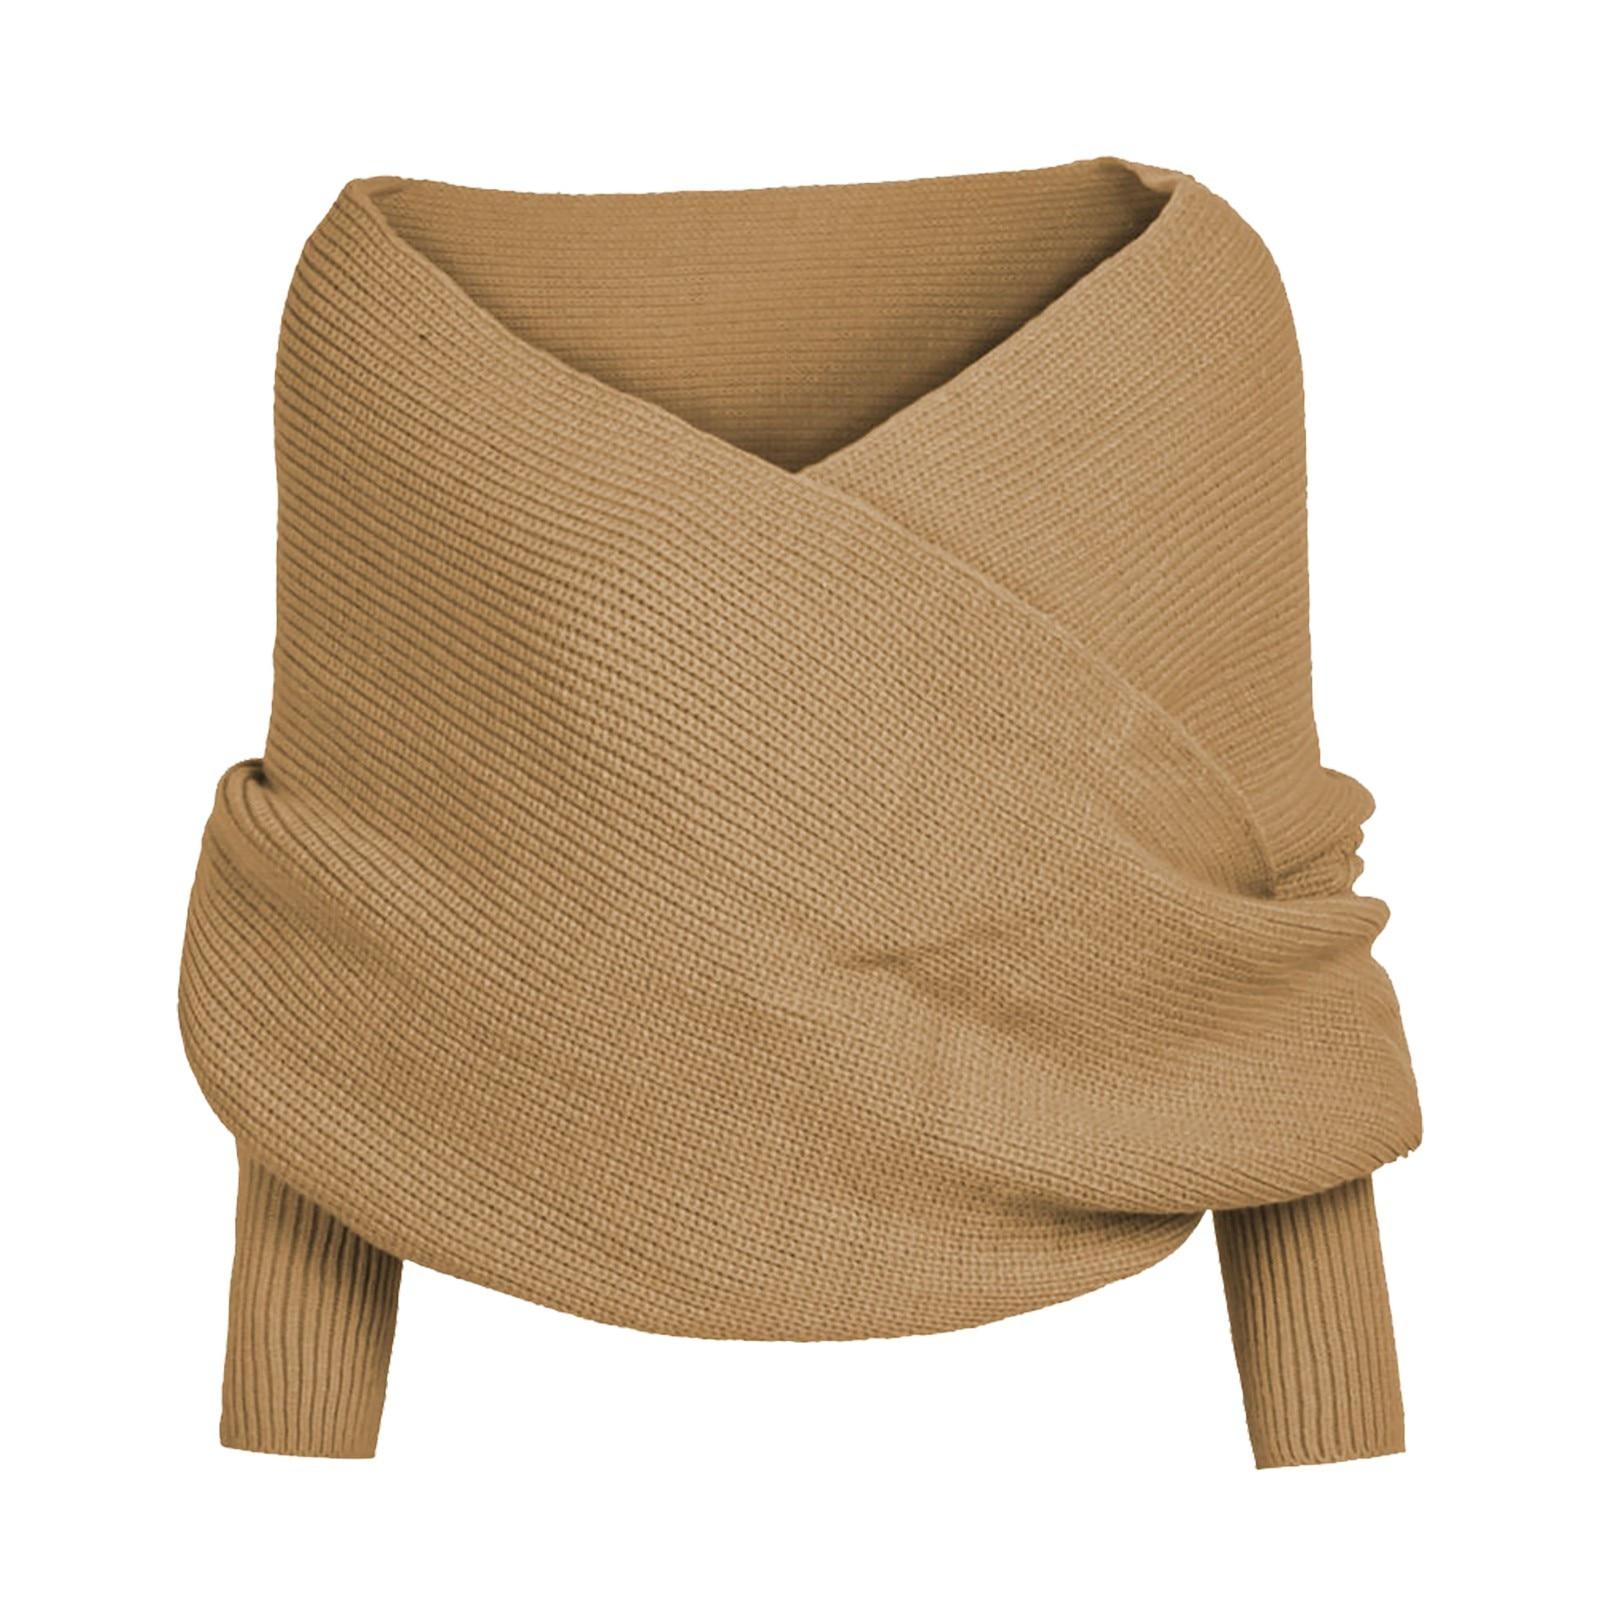 2020 Scarf Women Solid Scarf  Sleeve Crochet Knit Long Soft Winter Shawl шарф женский зимний